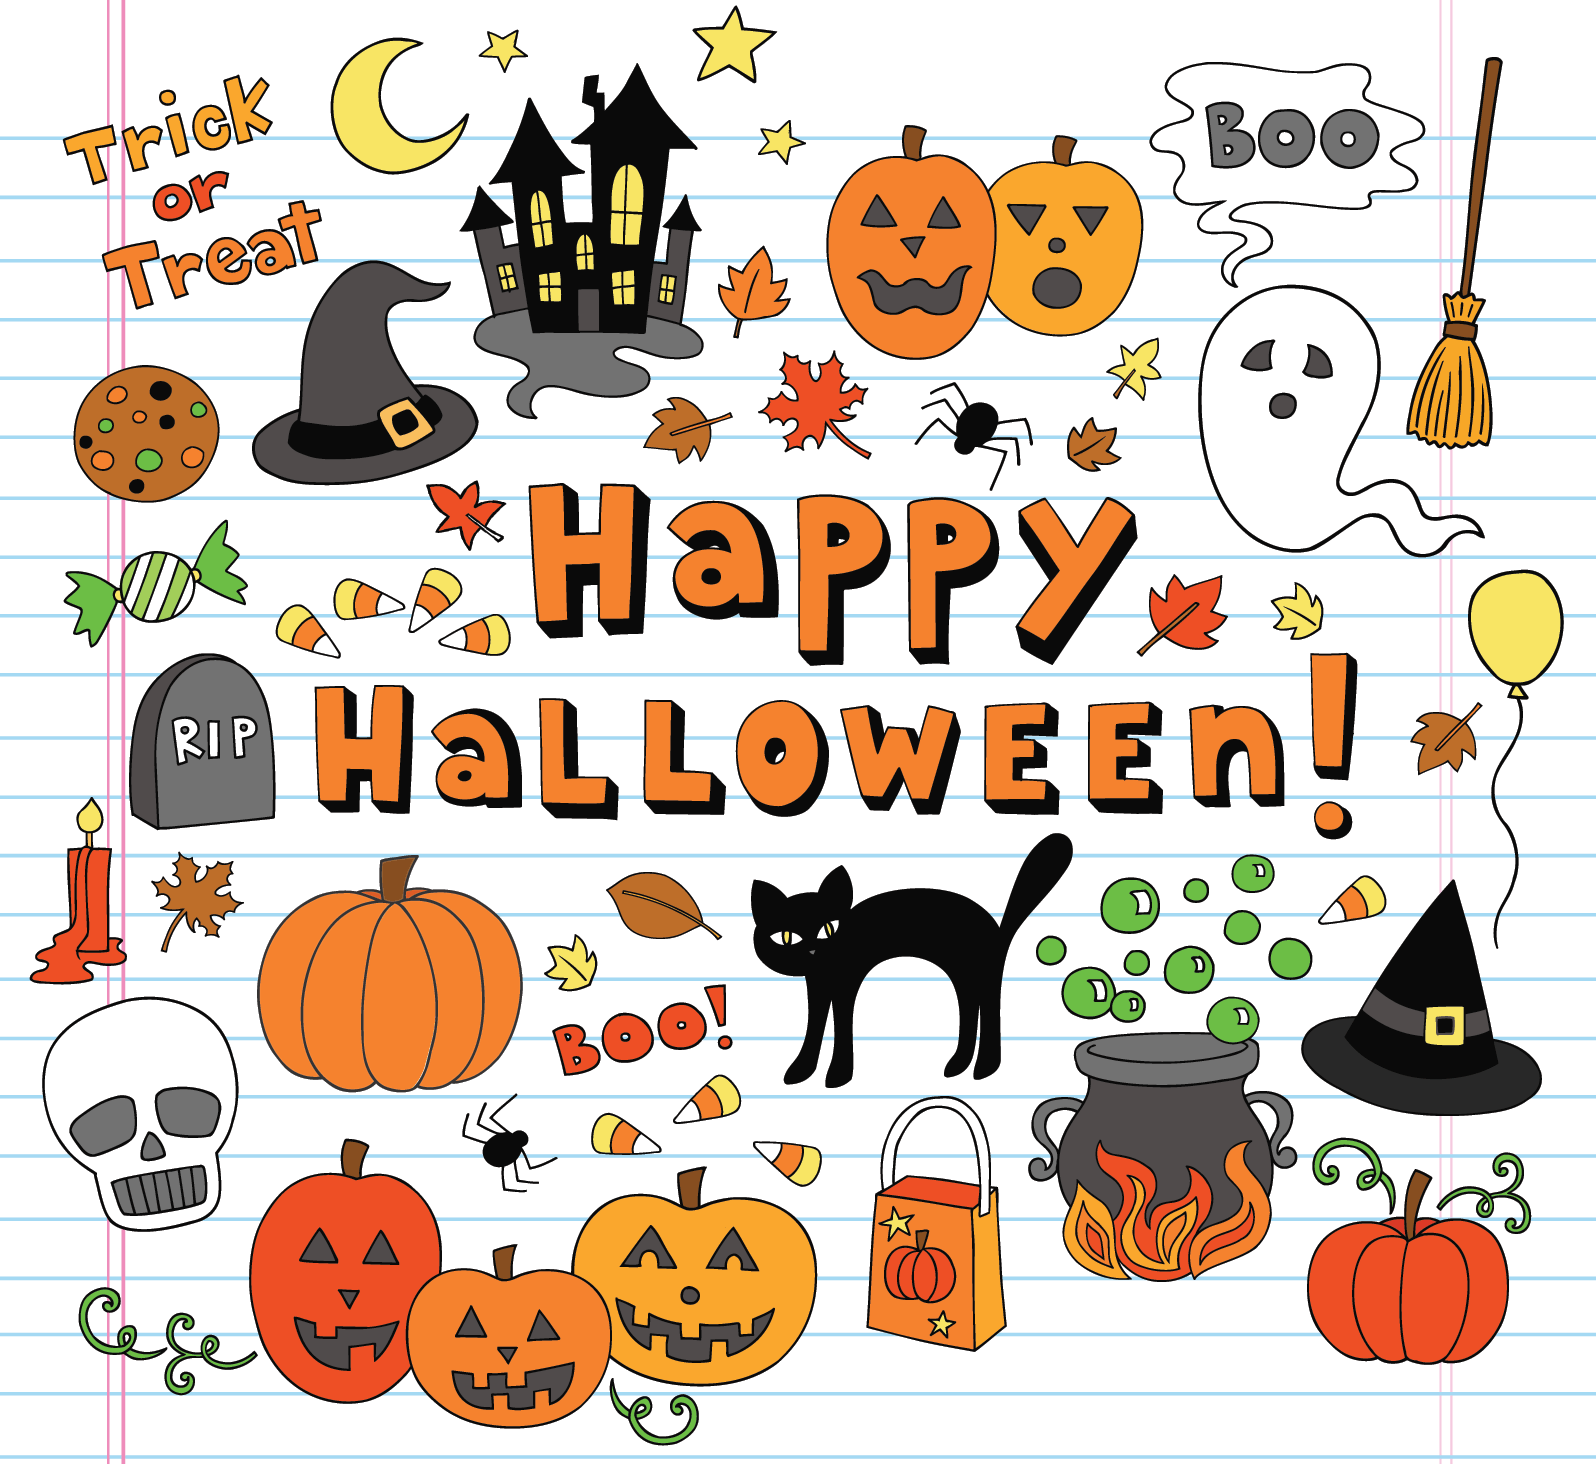 Halloween Writing Prompts Resources Surfnetkids